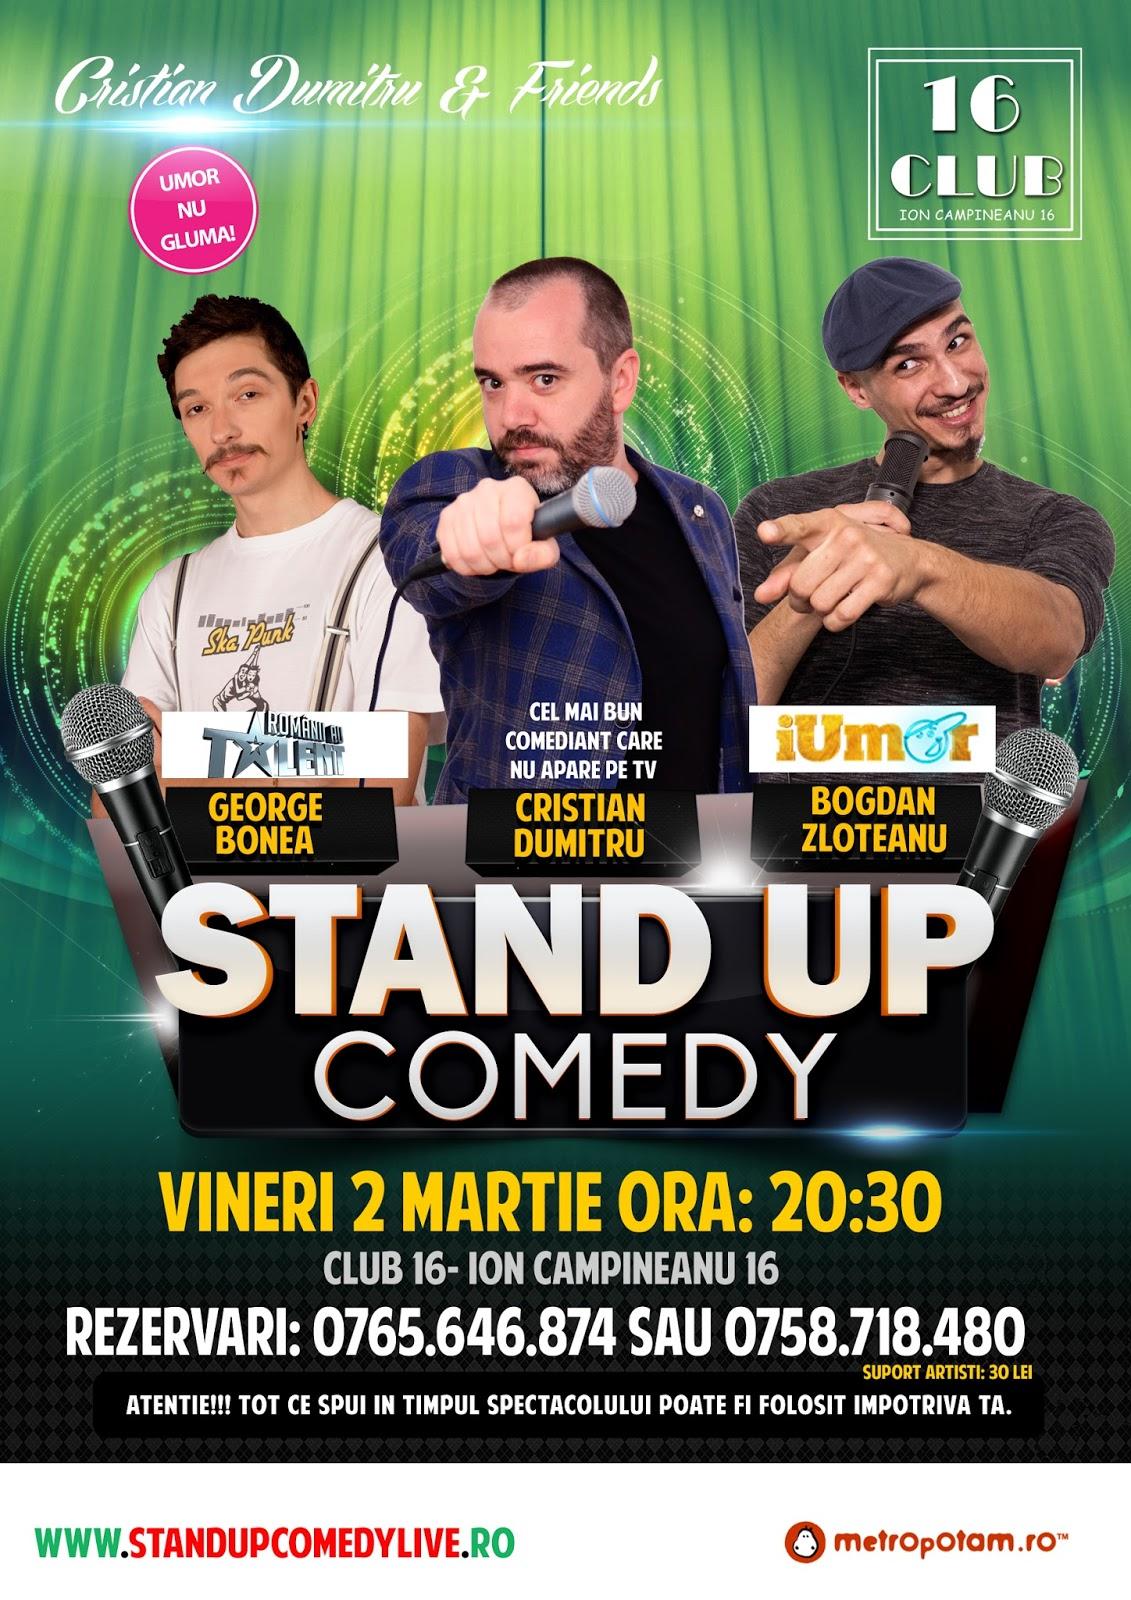 Stand-Up Comedy Vineri 2 Martie Bucuresti